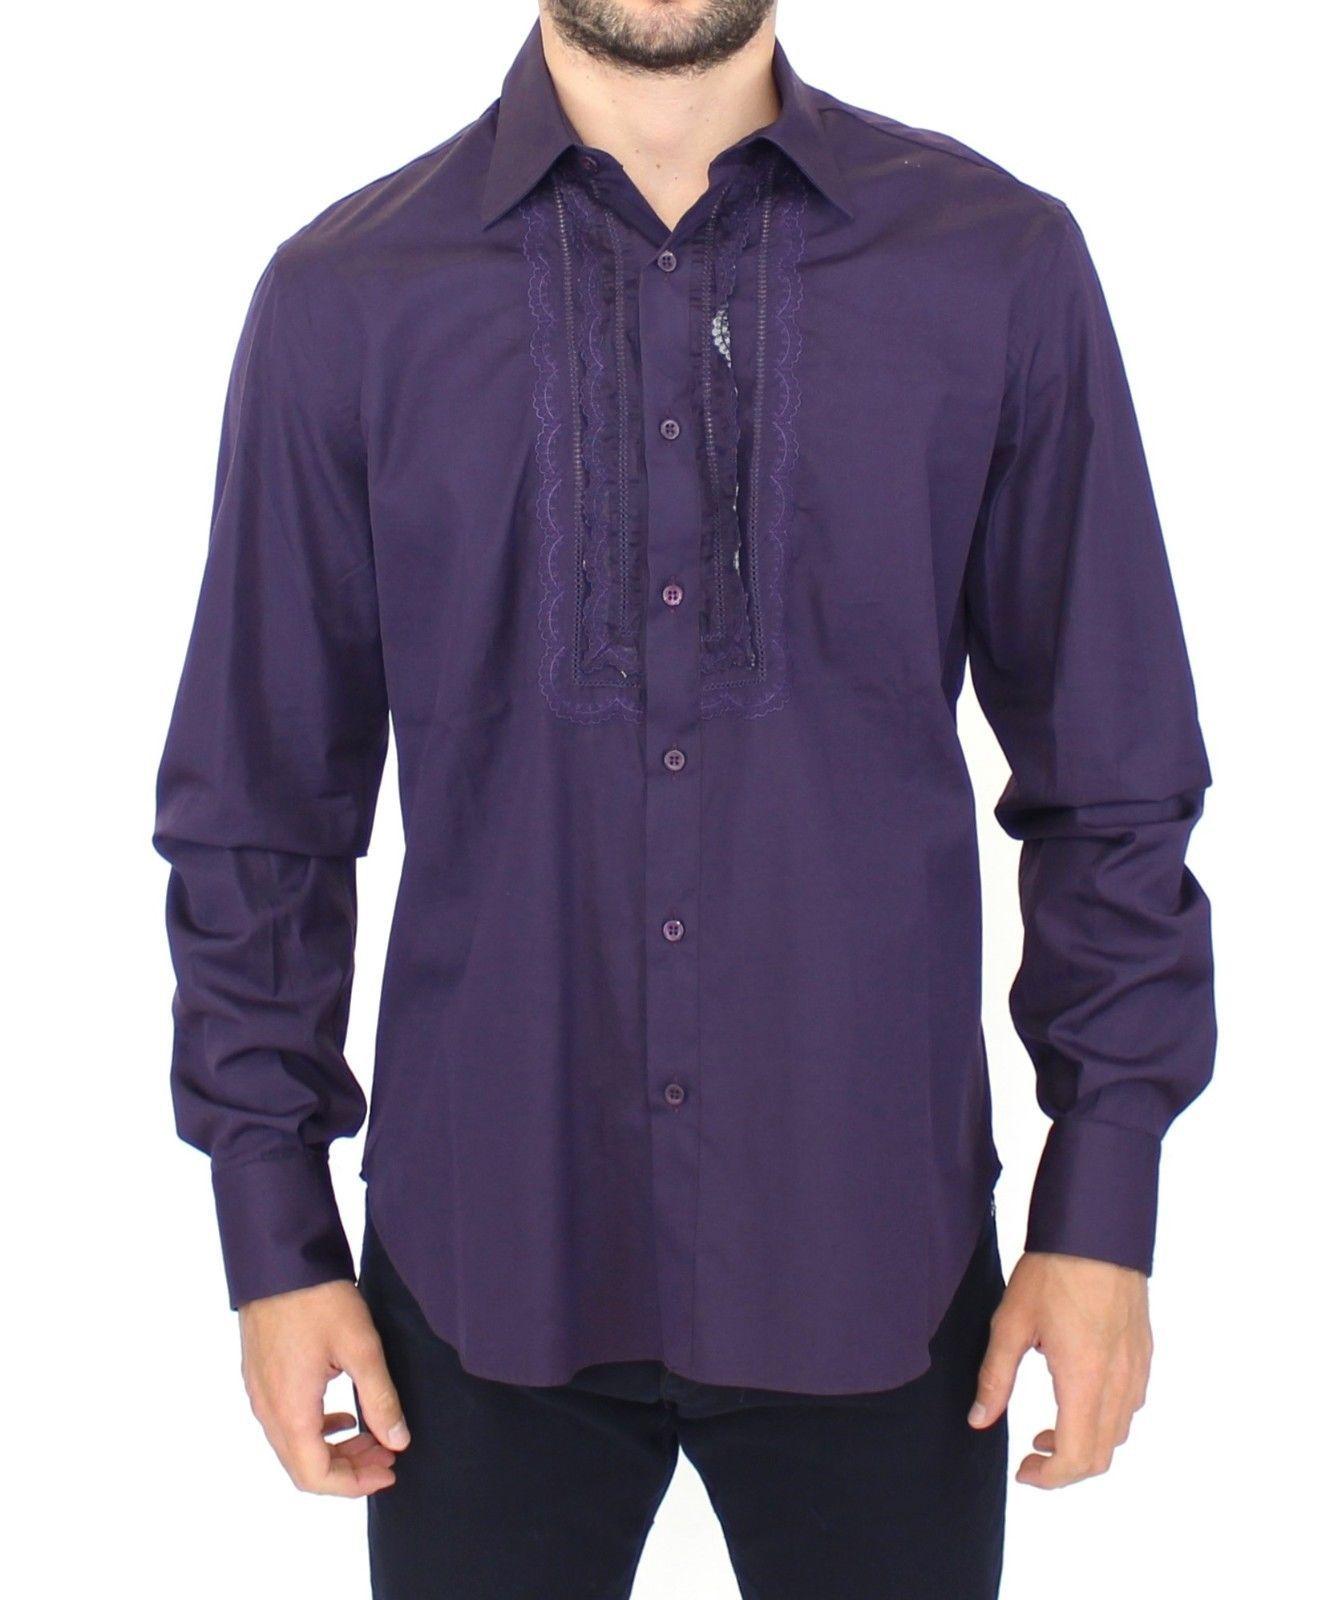 Ermanno Scervino Purple Cotton Long Sleeve Casual Shirt Top